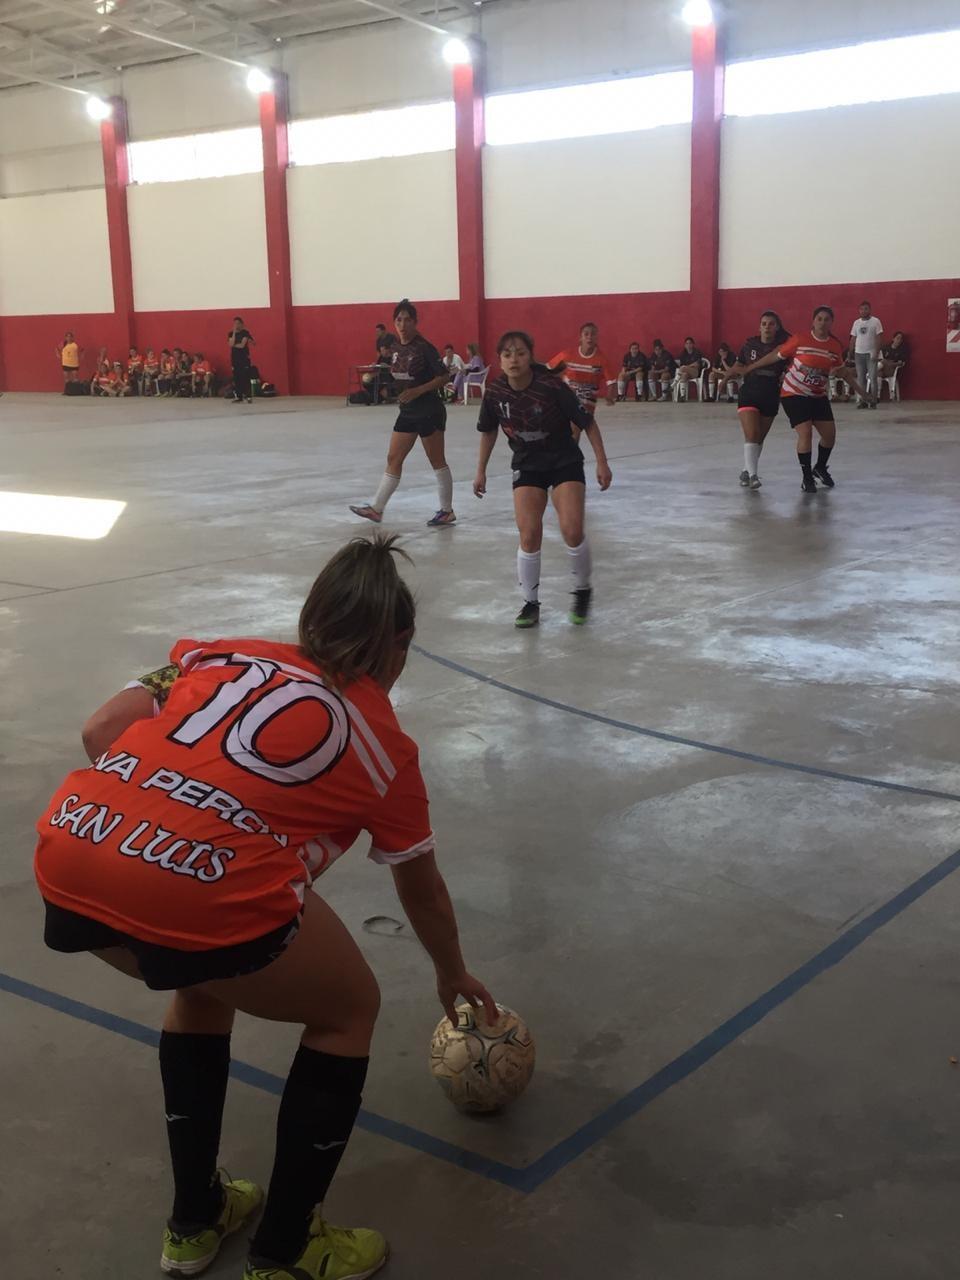 Mañana arranca una nueva fecha de Futsal